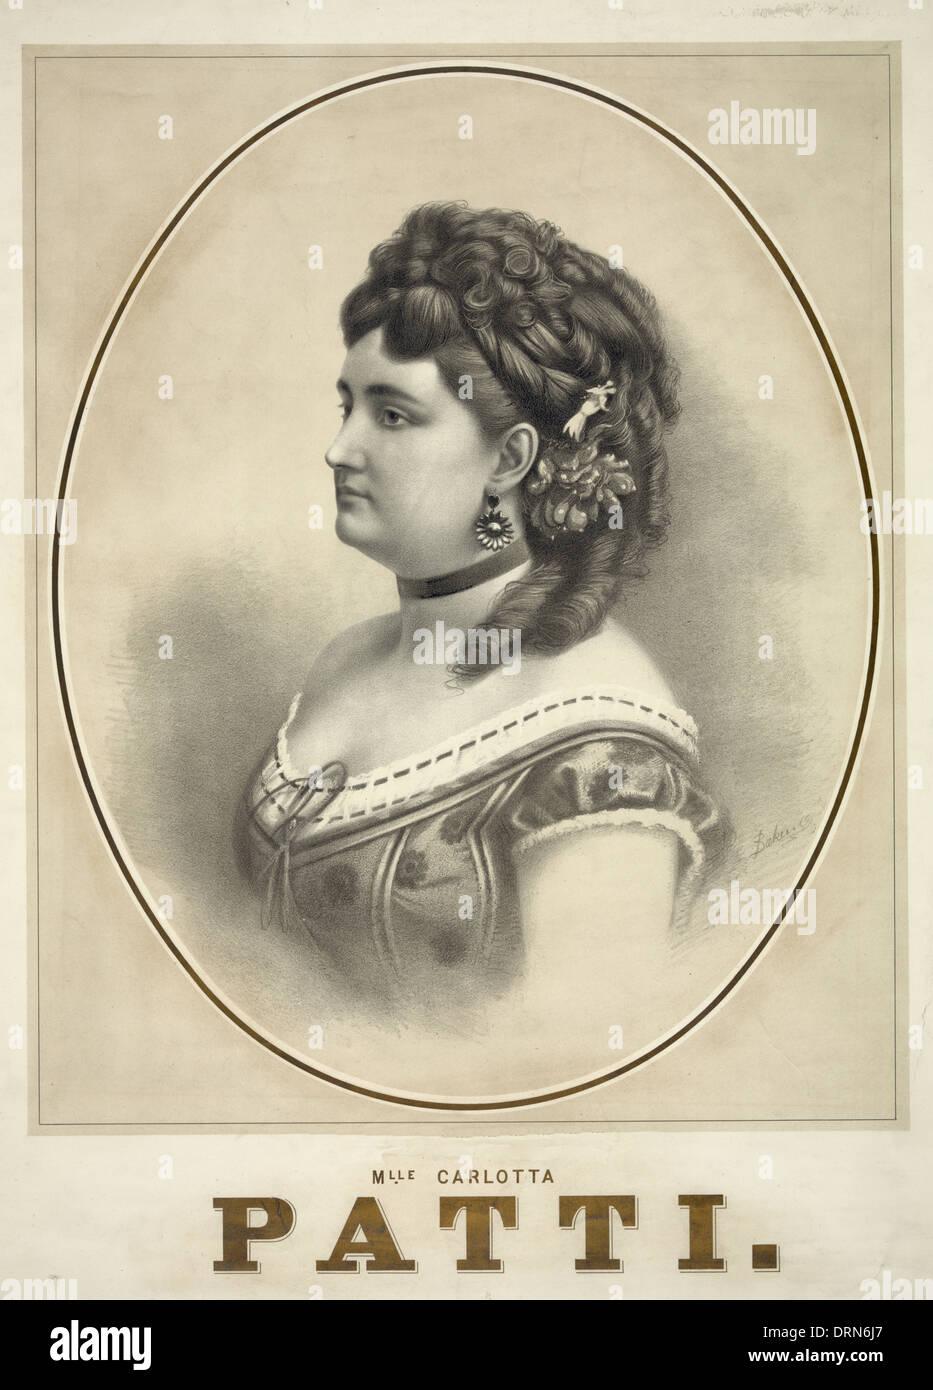 Carlotta Patti -  (c. 1840 – 27 June 1889) was a nineteenth-century operatic soprano, circa 1870 - Stock Image